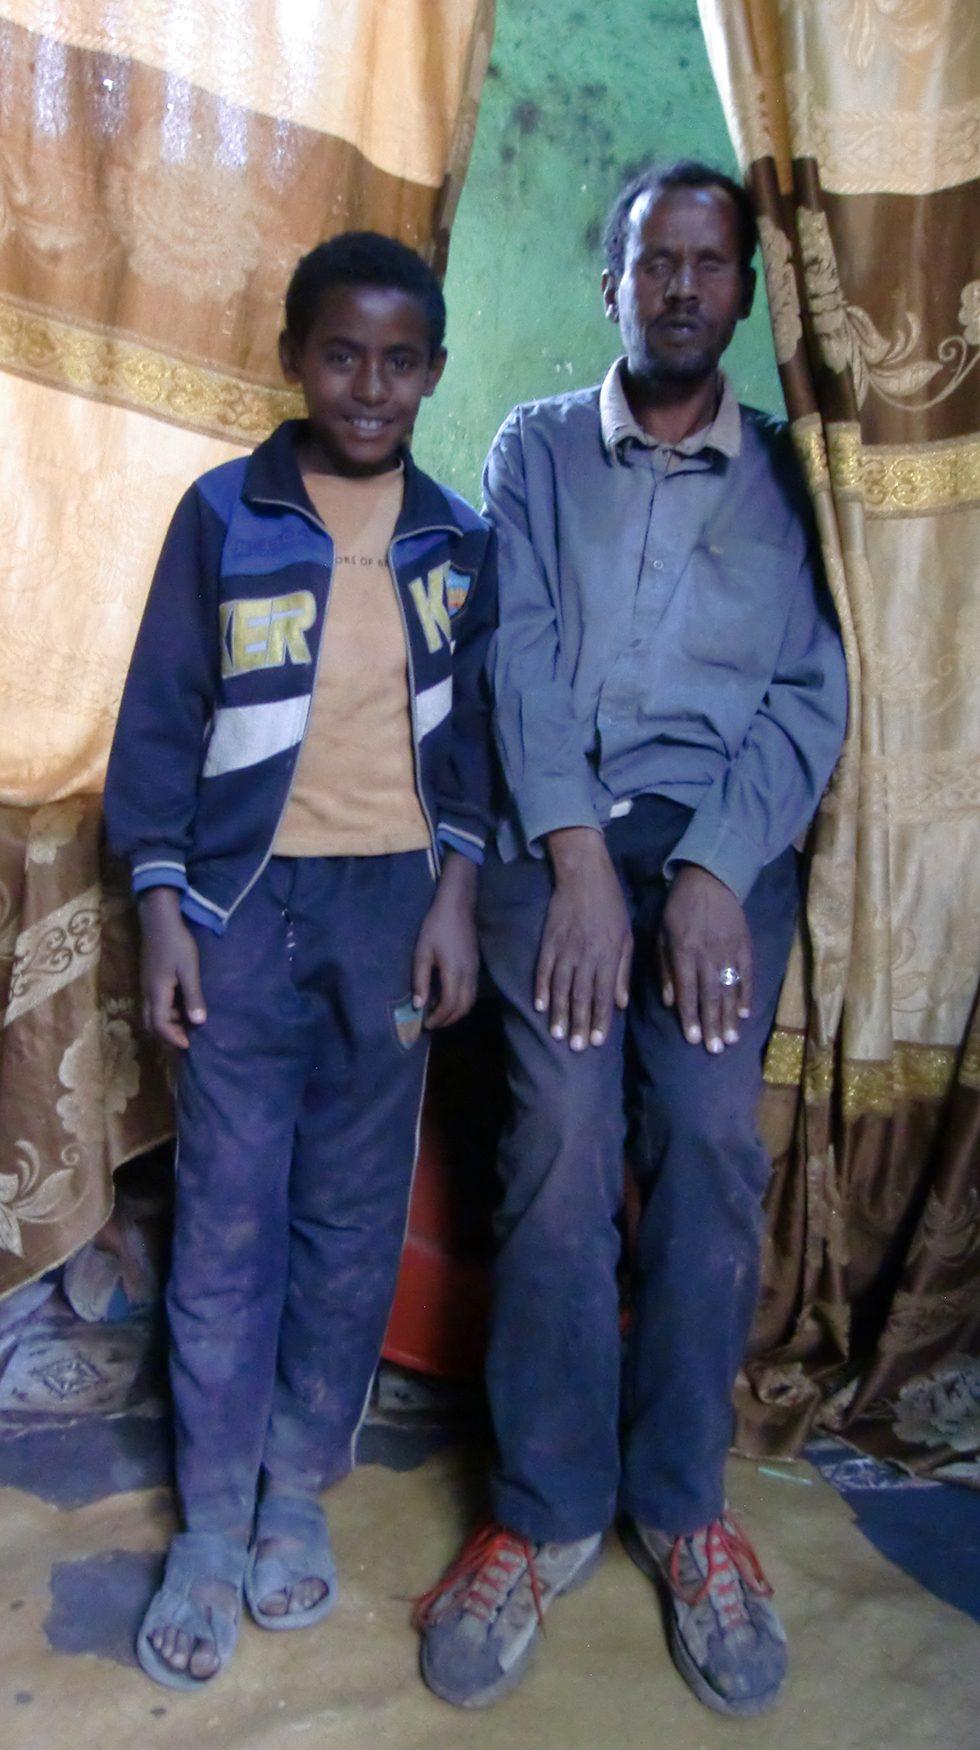 Dez. 2017 - Vater Ayalew mit Sohn Befekadu